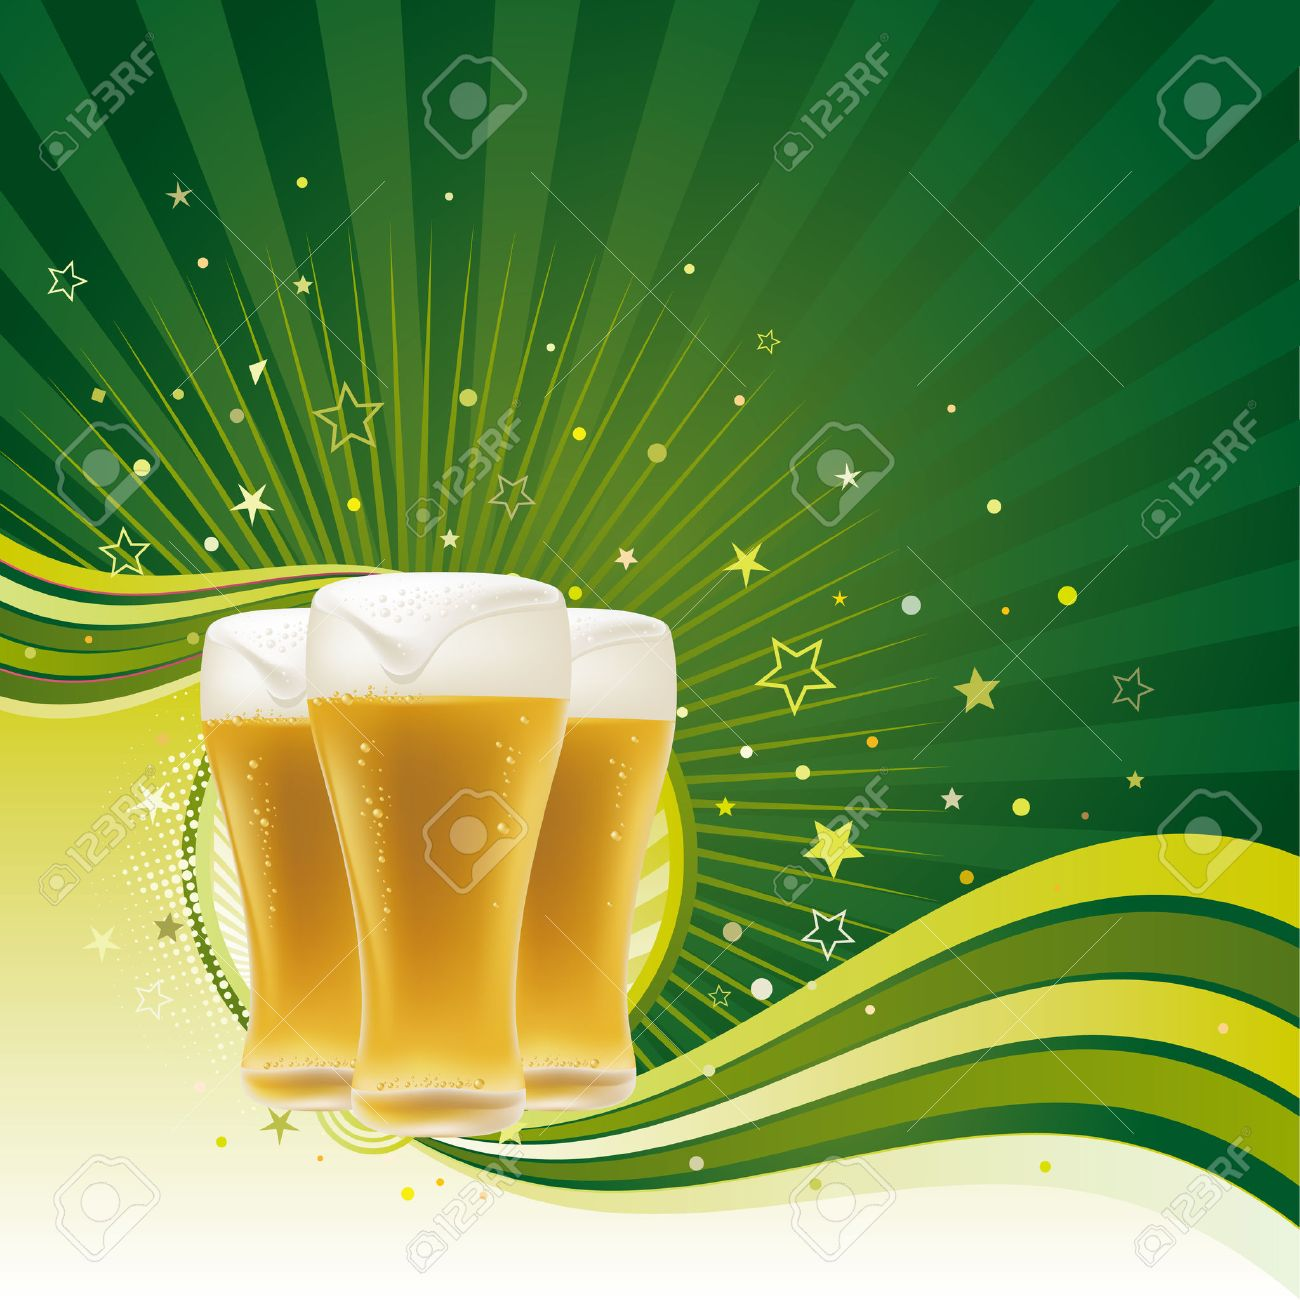 beer design element,abstract backgrounds Stock Vector - 7580330